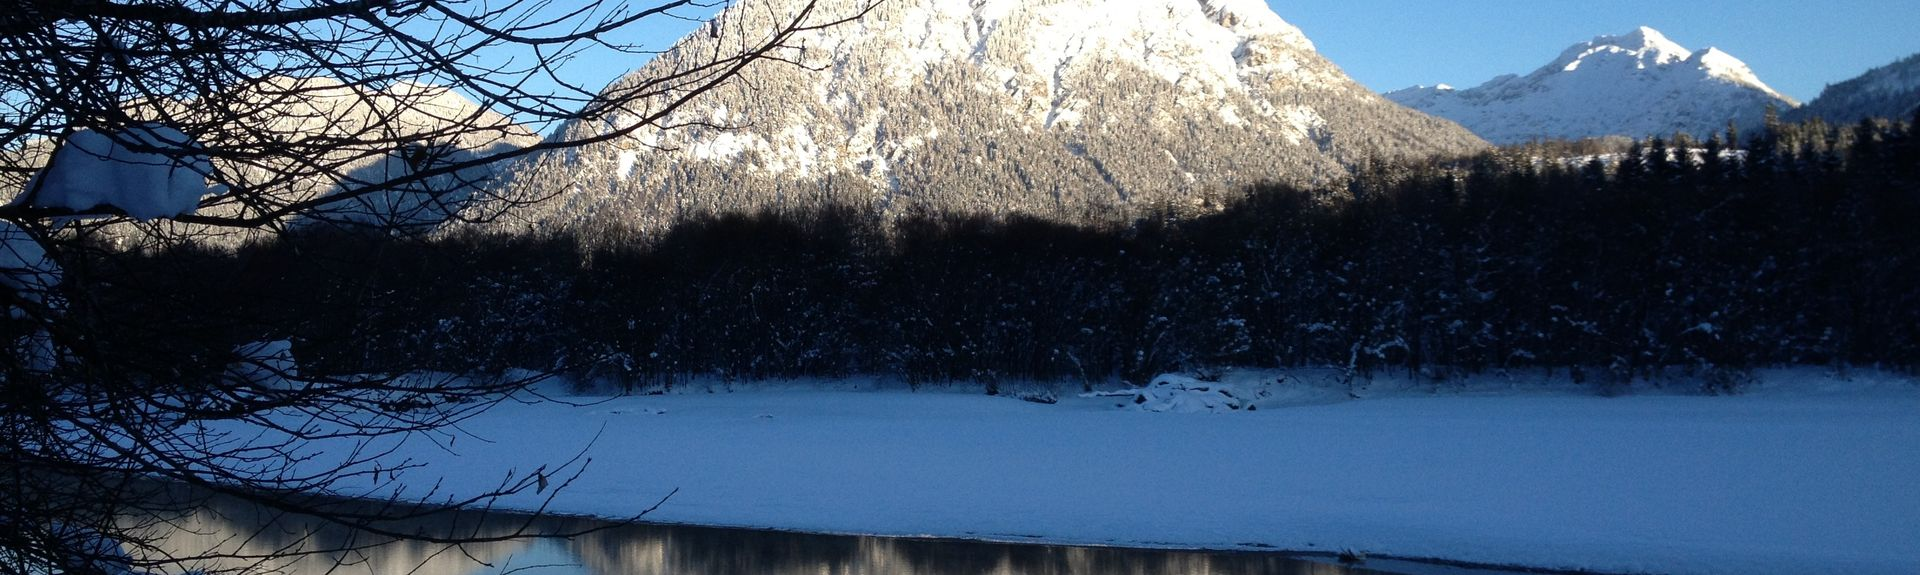 Ehrwalder Alm, Ehrwald, Tirol, Oostenrijk